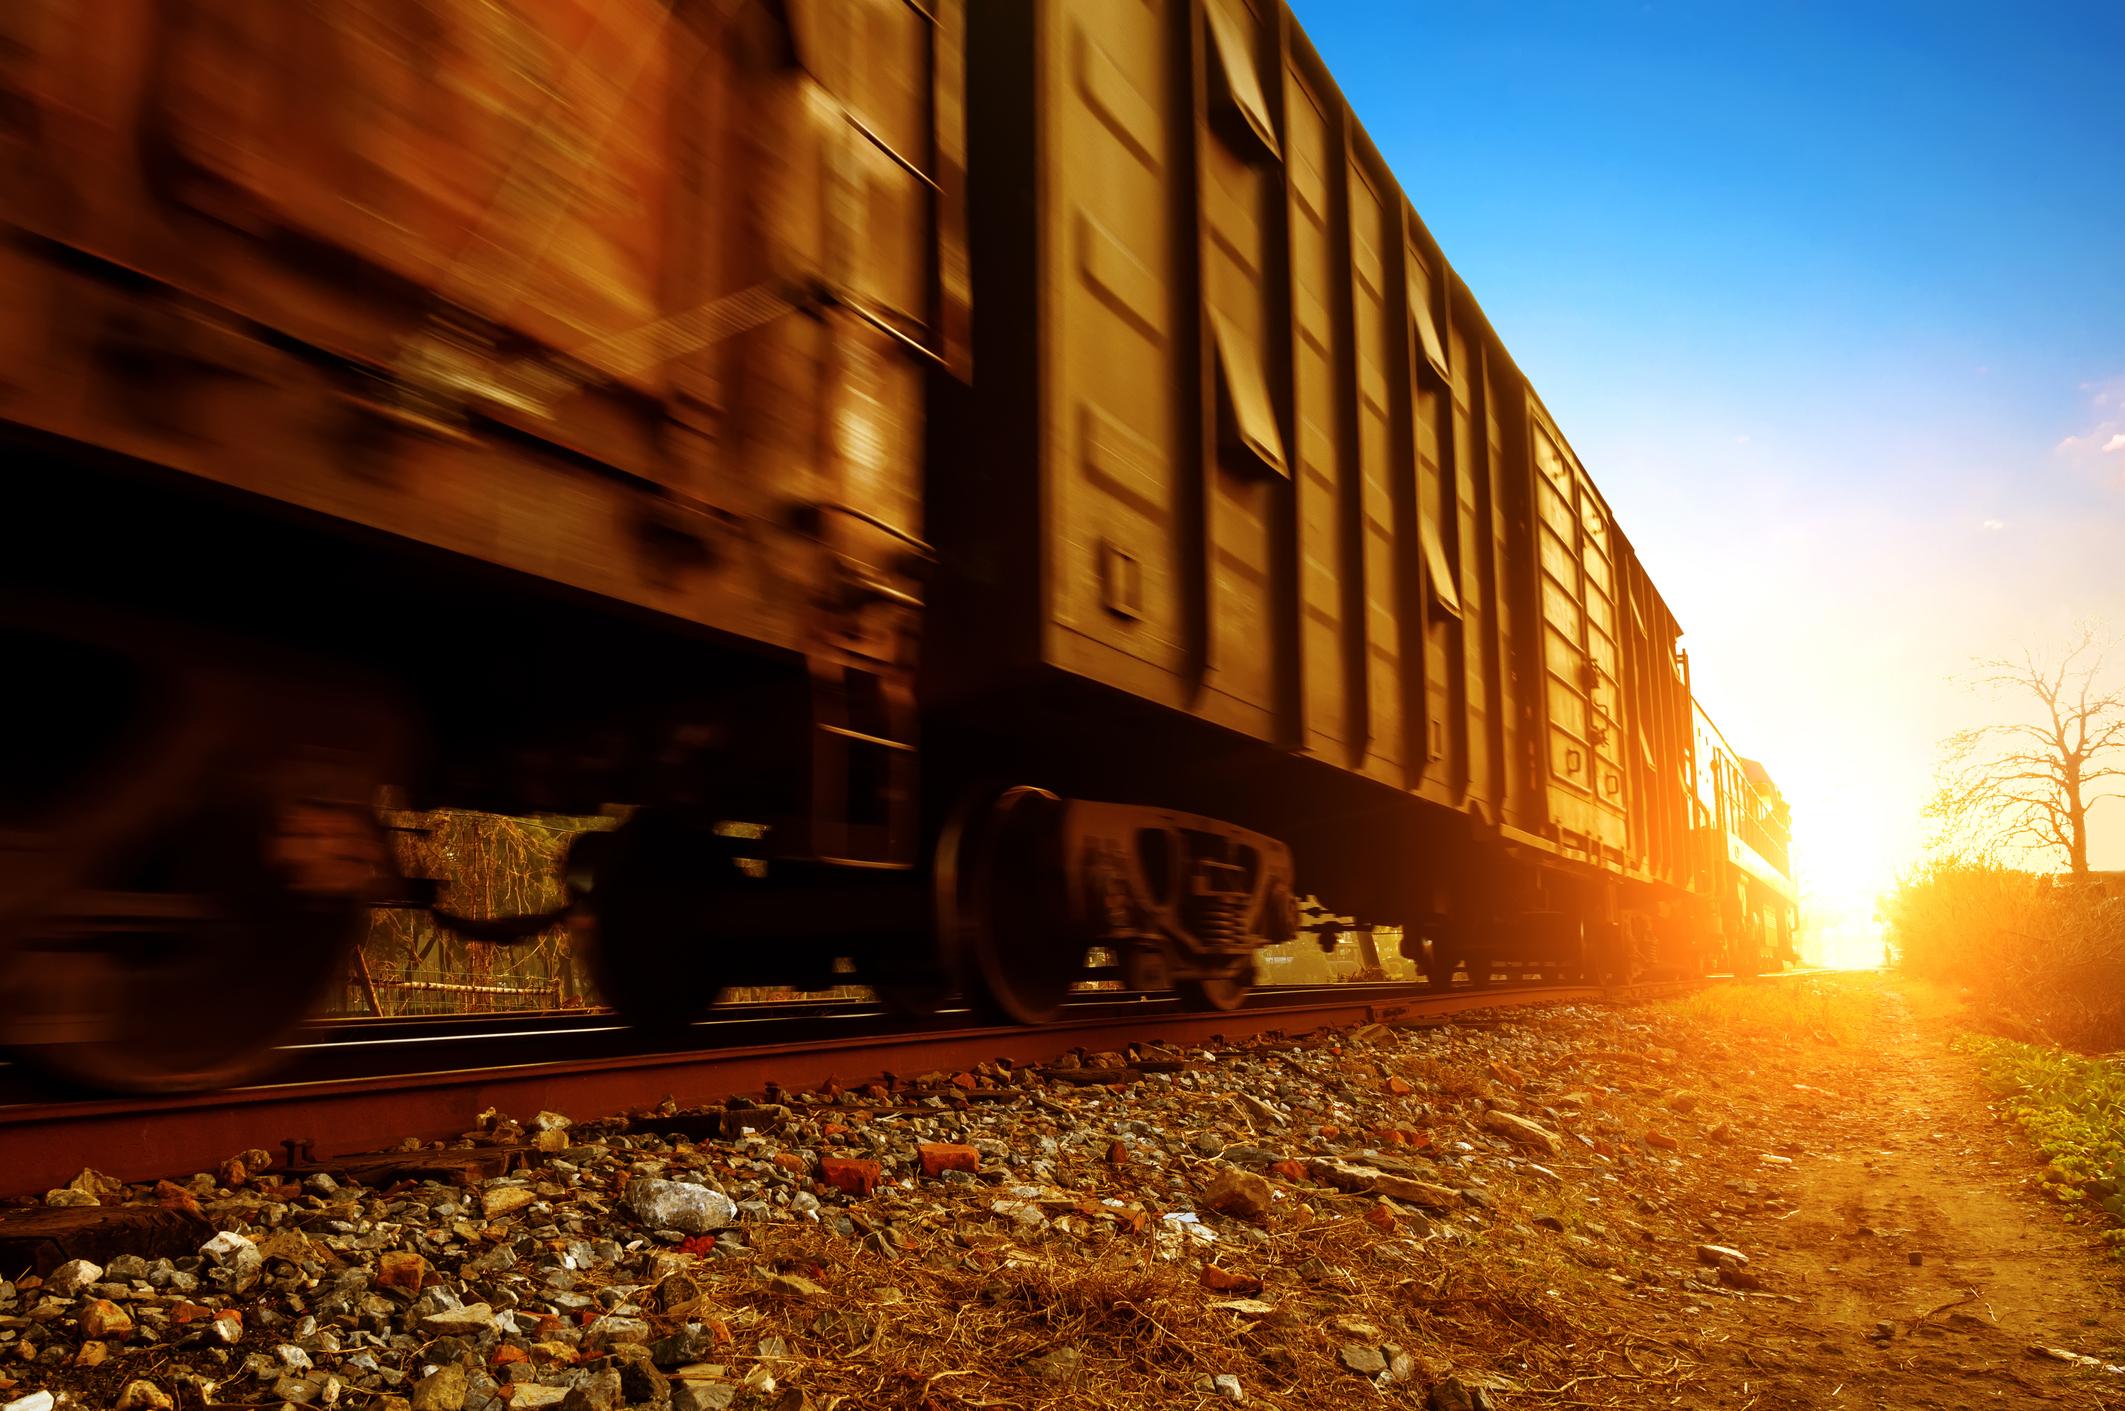 Freight train heading into sunset.